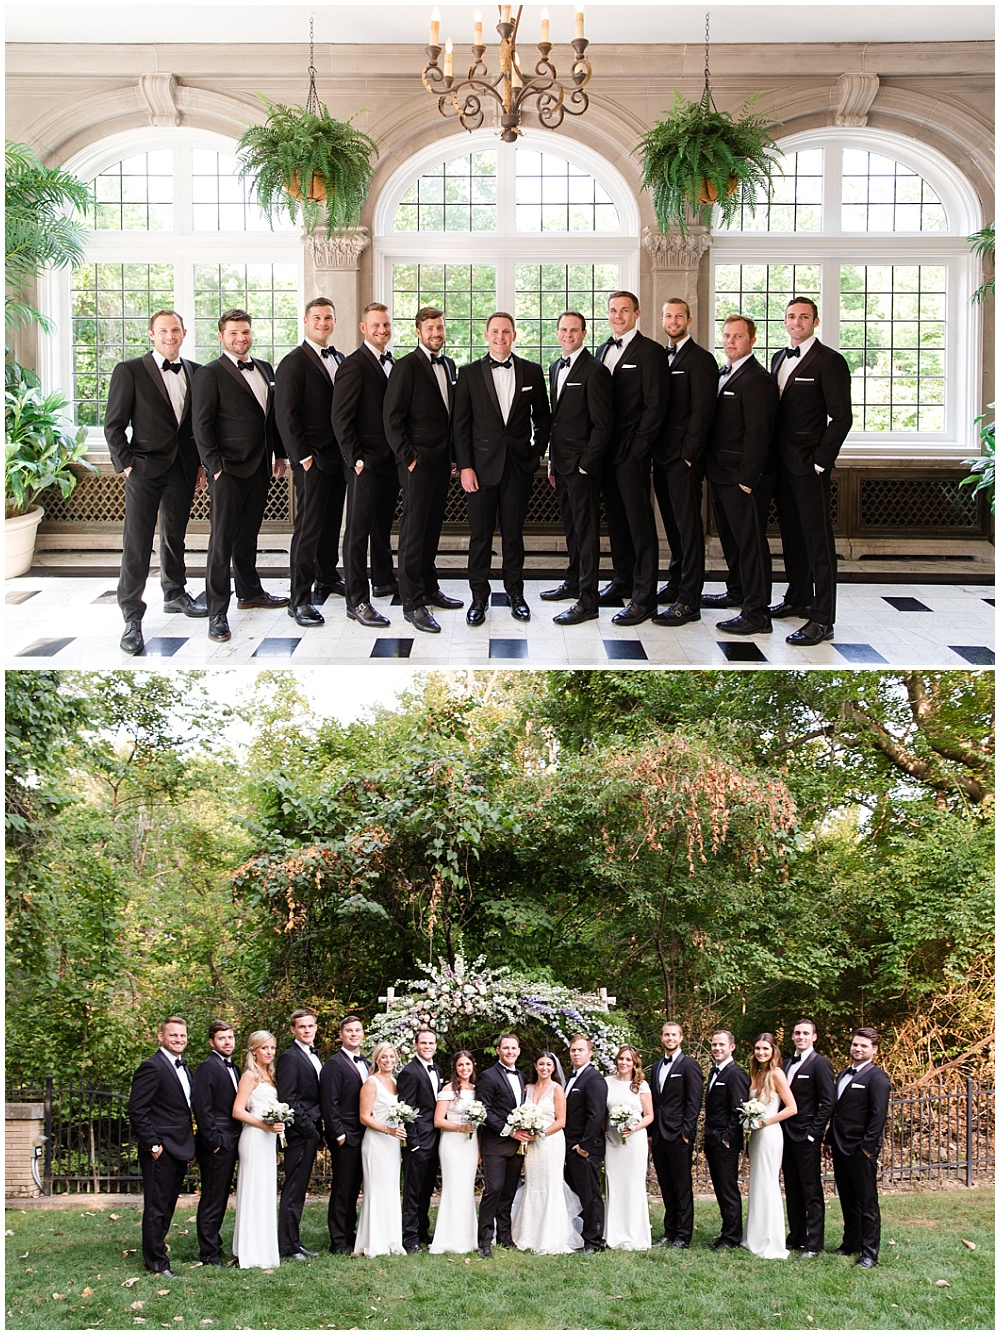 groomsmen; black tuxes; bridal party portraits; white bridesmaid dresses | Outdoor Terrace Wedding, Laurel Hall - Danielle Harris Photography; Jessica Dum Wedding Coordination